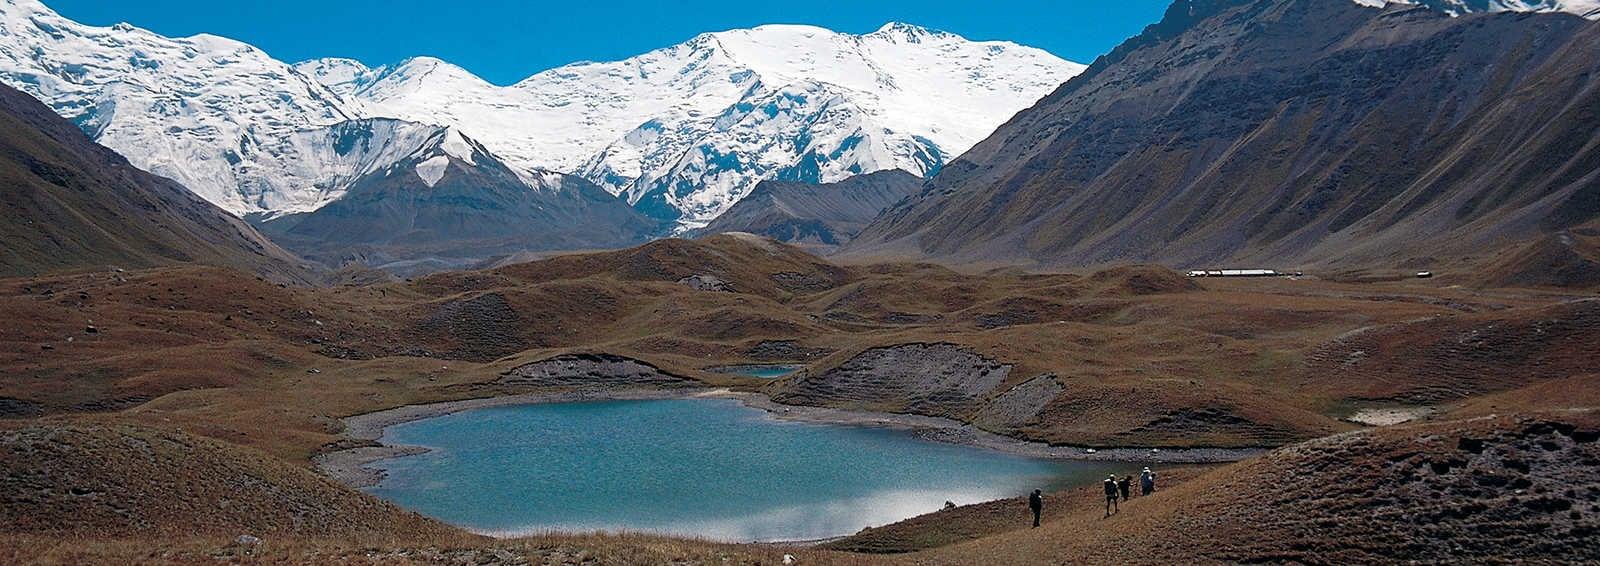 Peak Lenin from Achik Tash Valley, Pamirs,